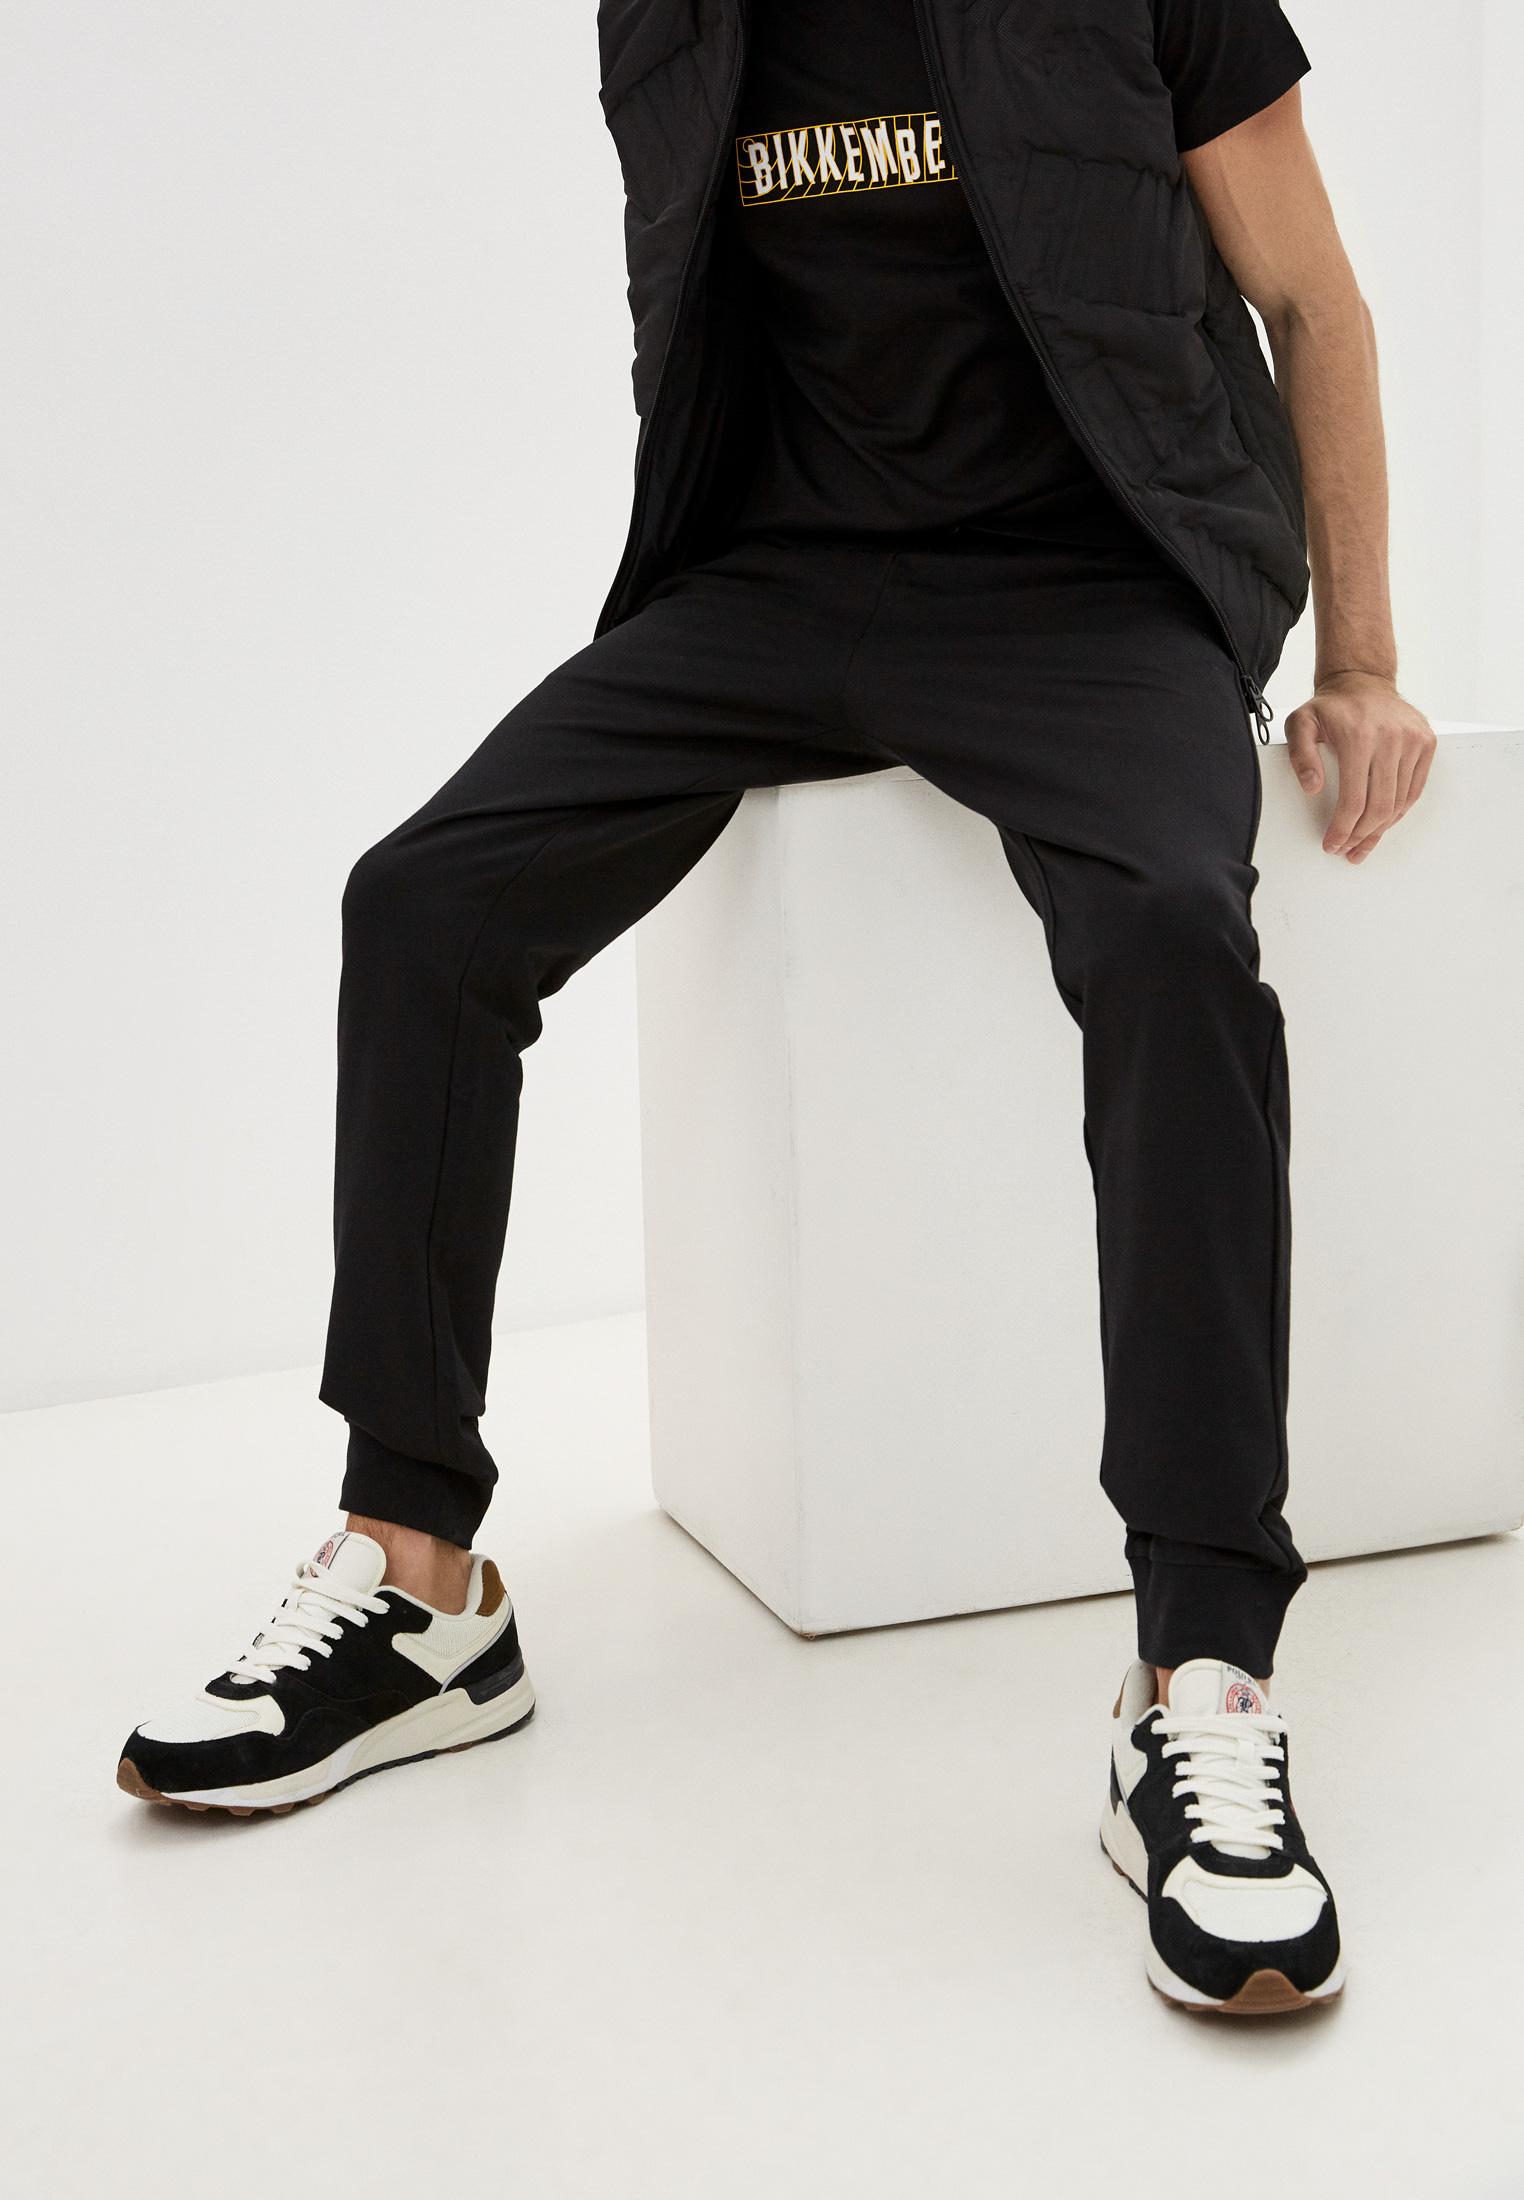 Мужские спортивные брюки Bikkembergs (Биккембергс) C 1 211 80 E 2276